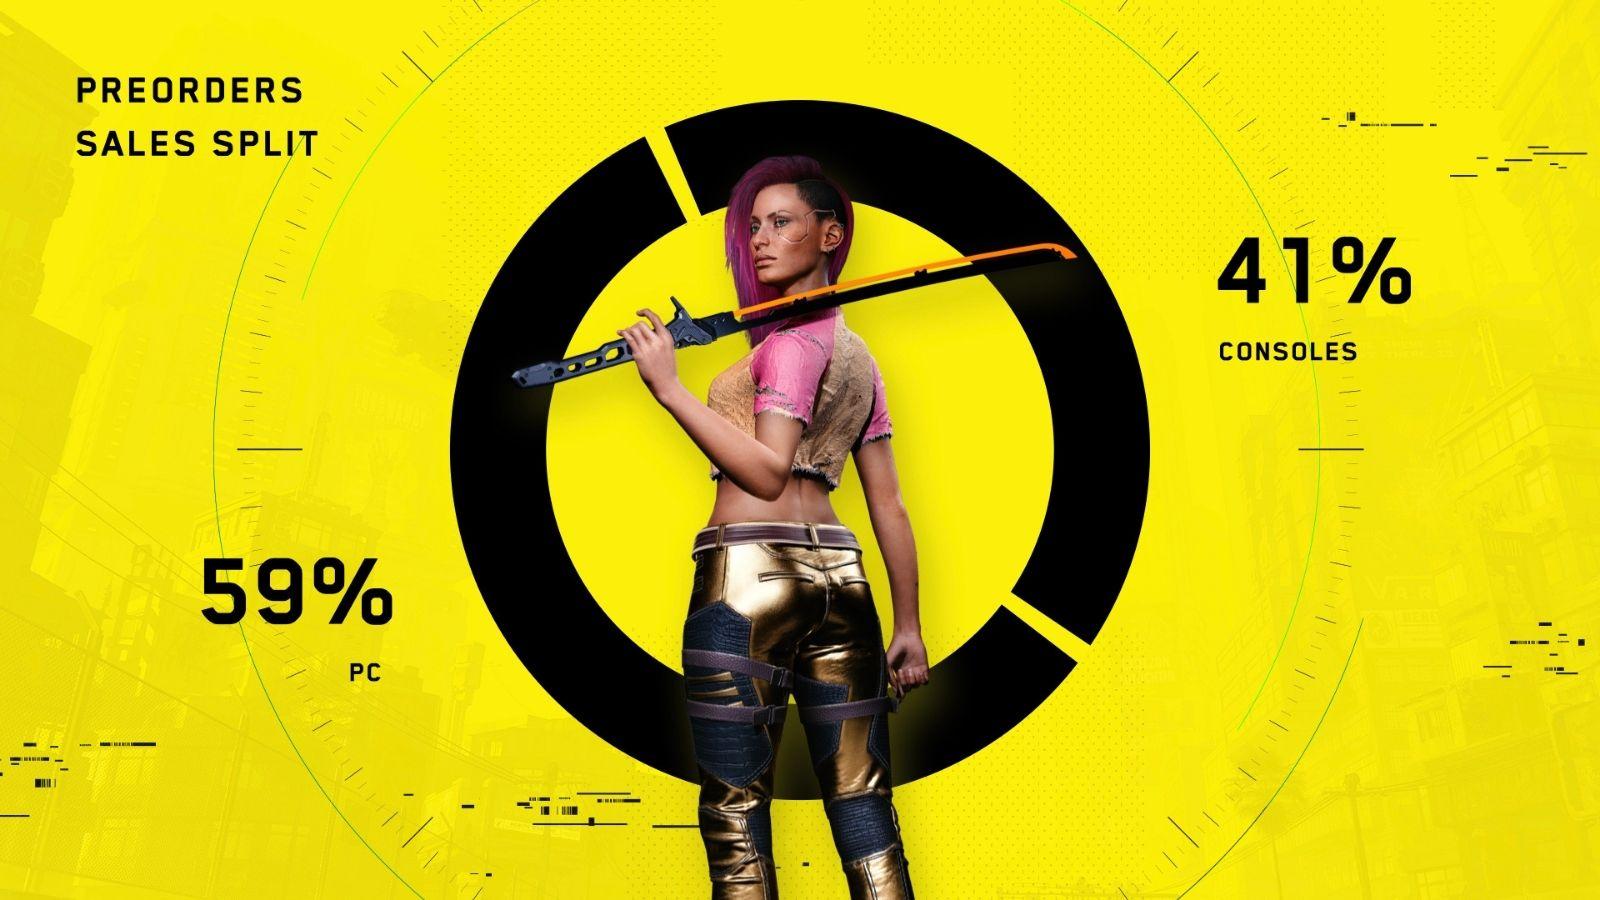 Cyberpunk 2077 marketing